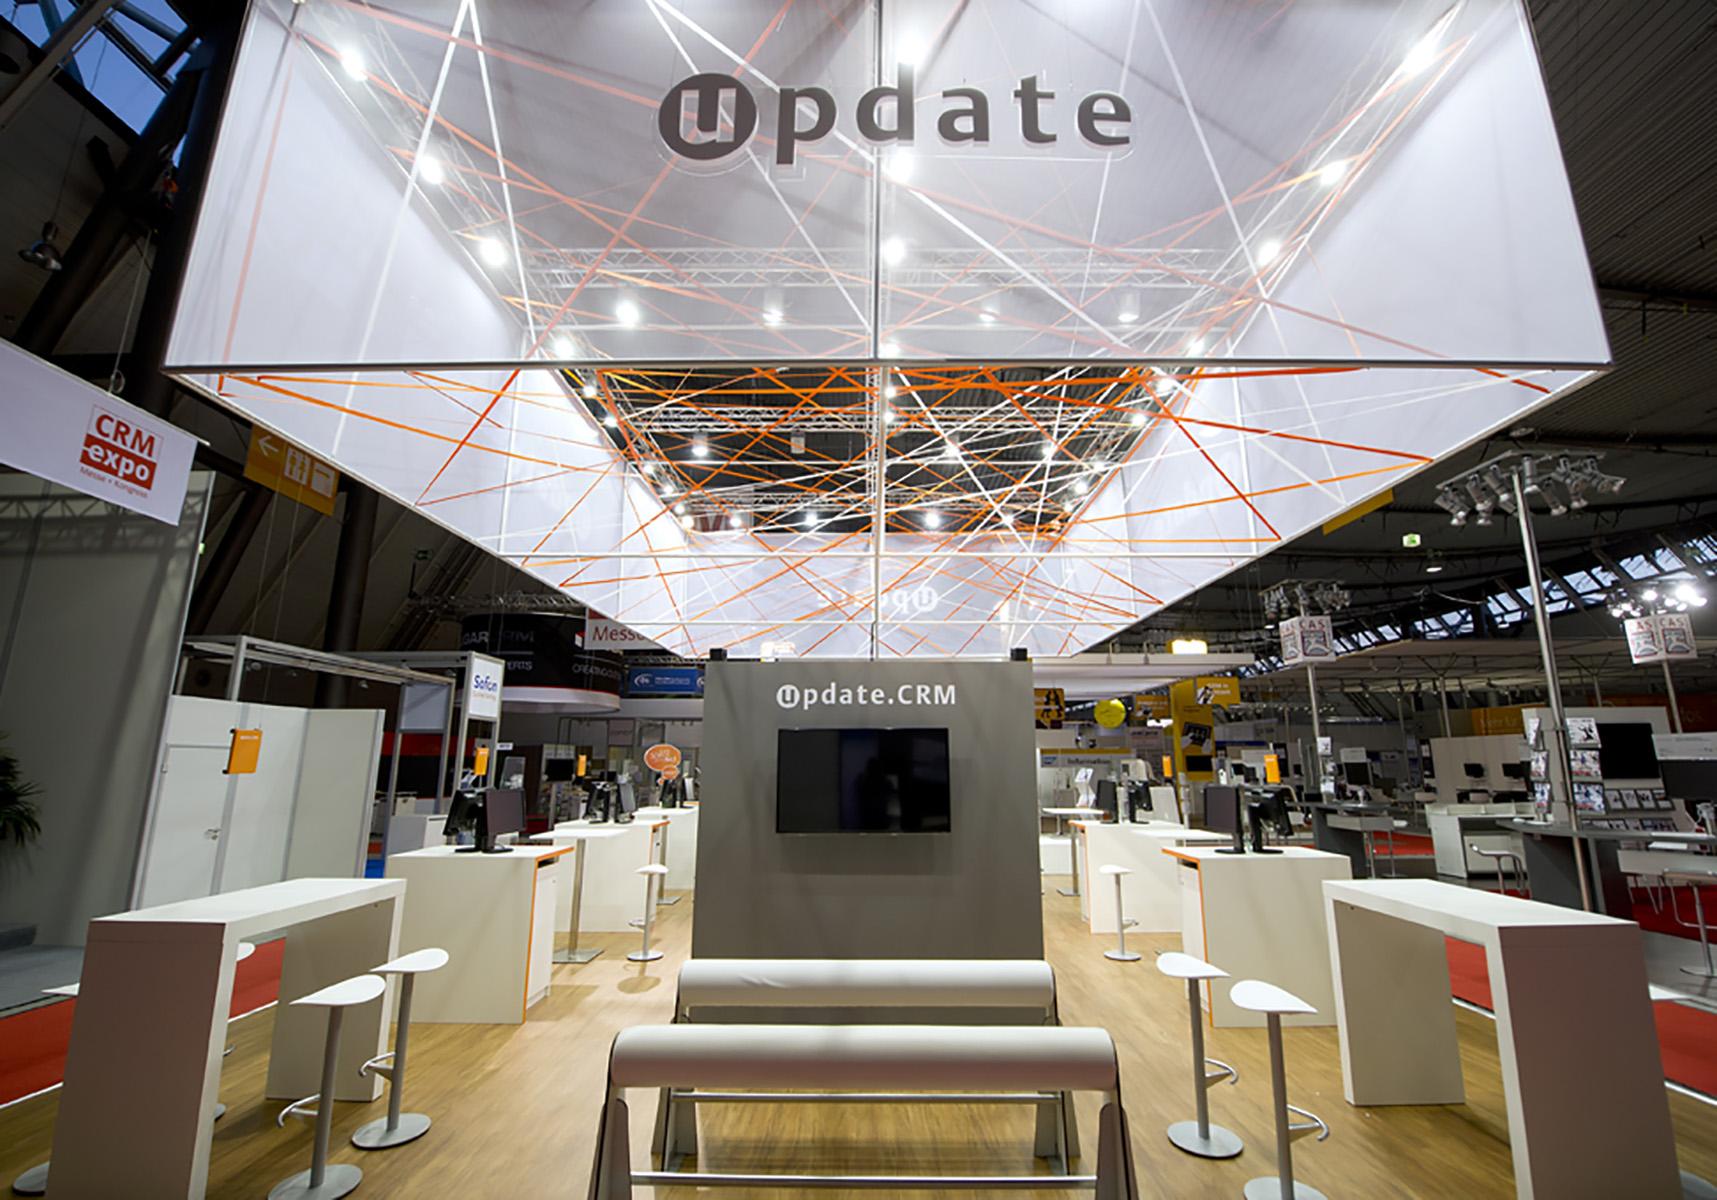 Update CRM Expo Stuttgart Messestand von Blickfang Messebau 3 - Detailaufnahme